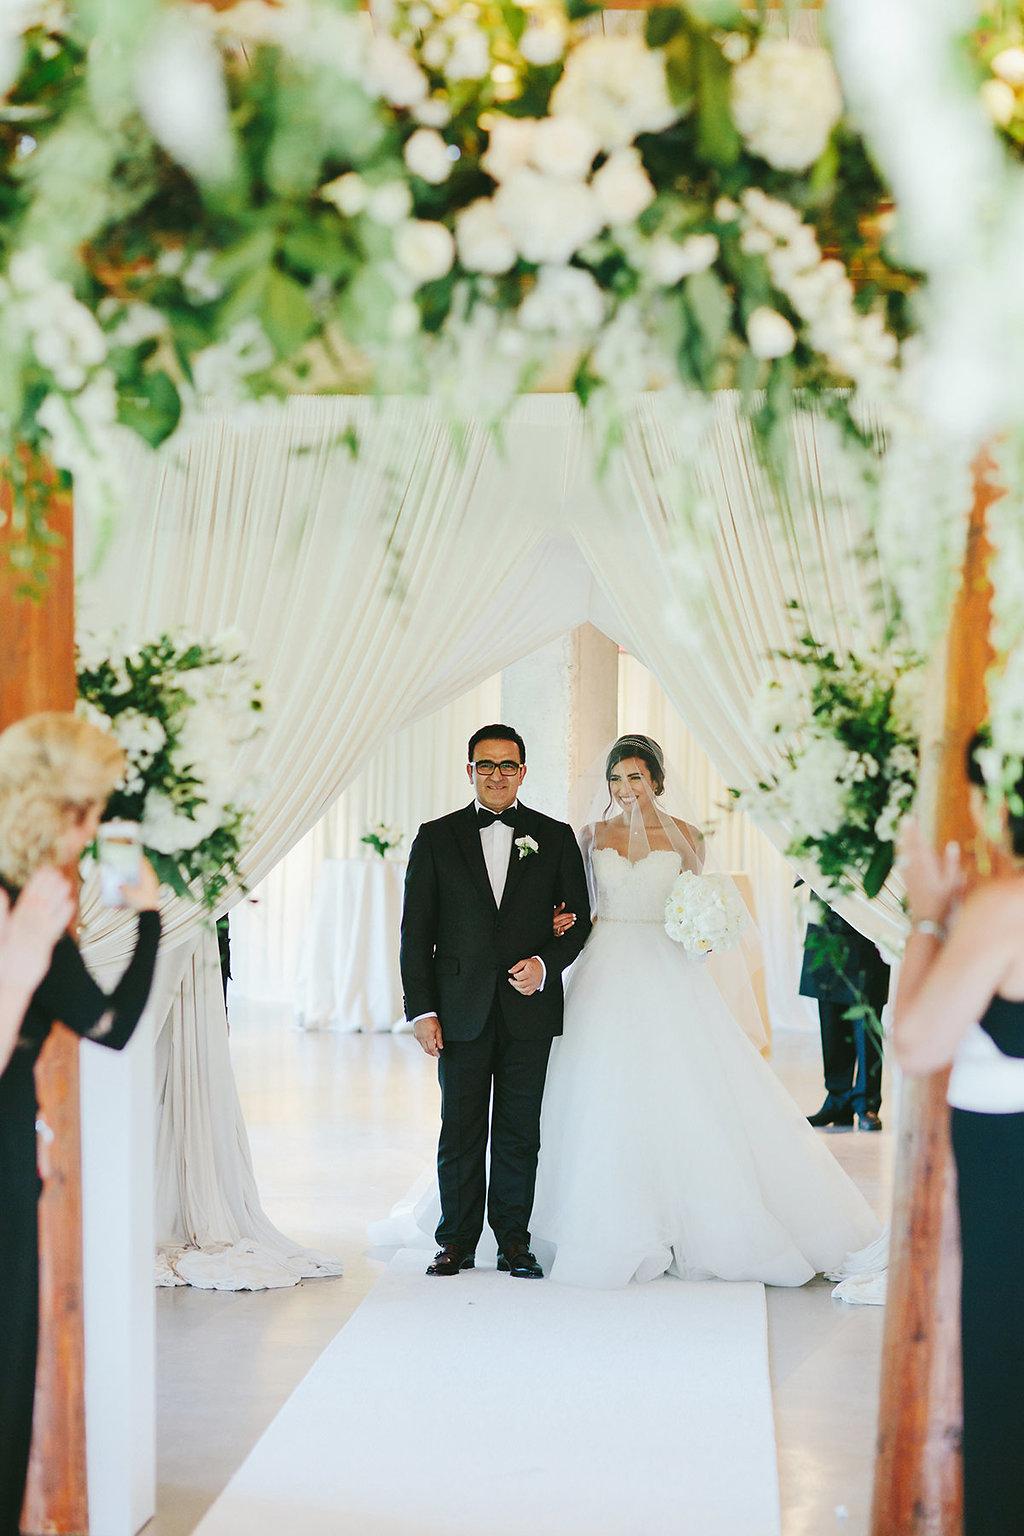 bridal processionals - photo by Melia Lucida https://ruffledblog.com/elegant-canadian-wedding-with-greenery